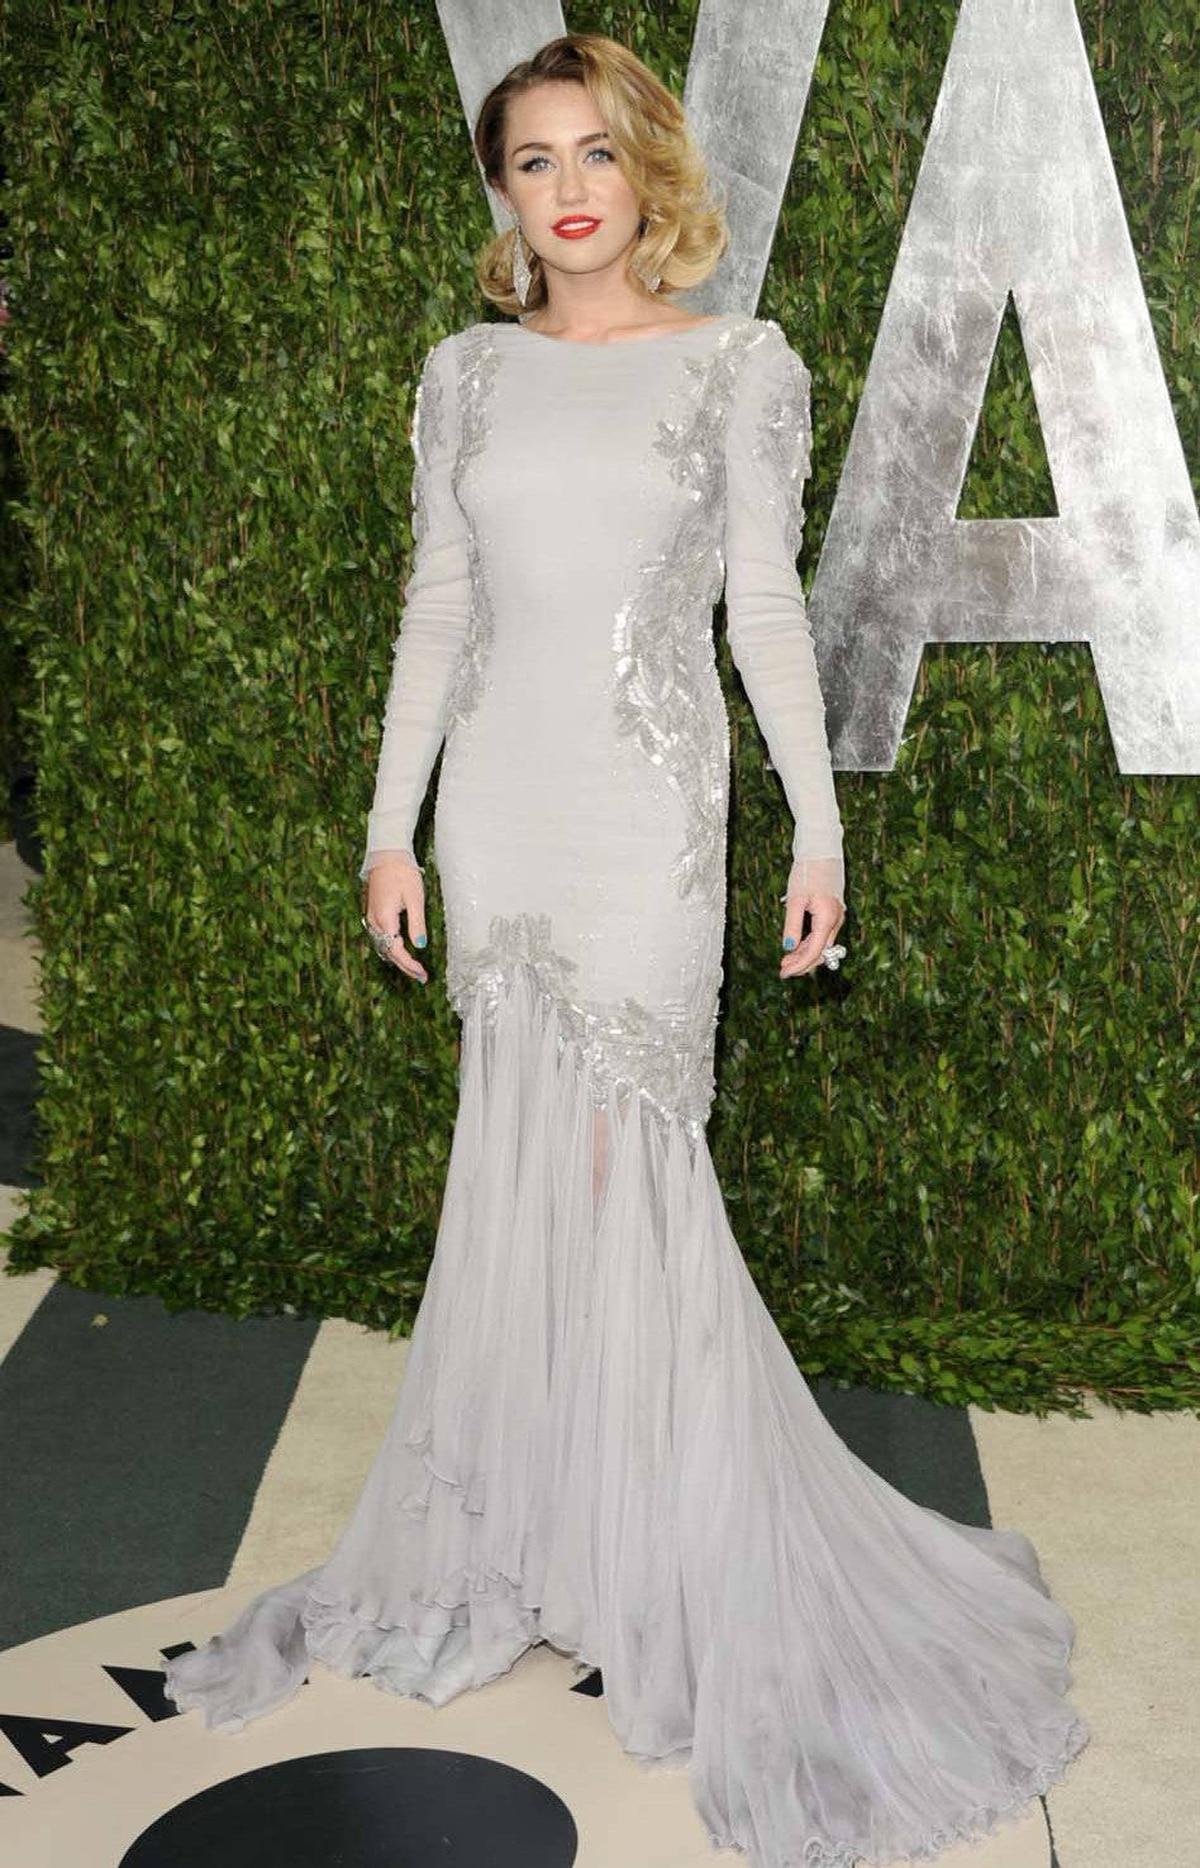 Miley Cyrus wore Roberto Cavalli to the Vanity Fair Oscar party on Sunday.